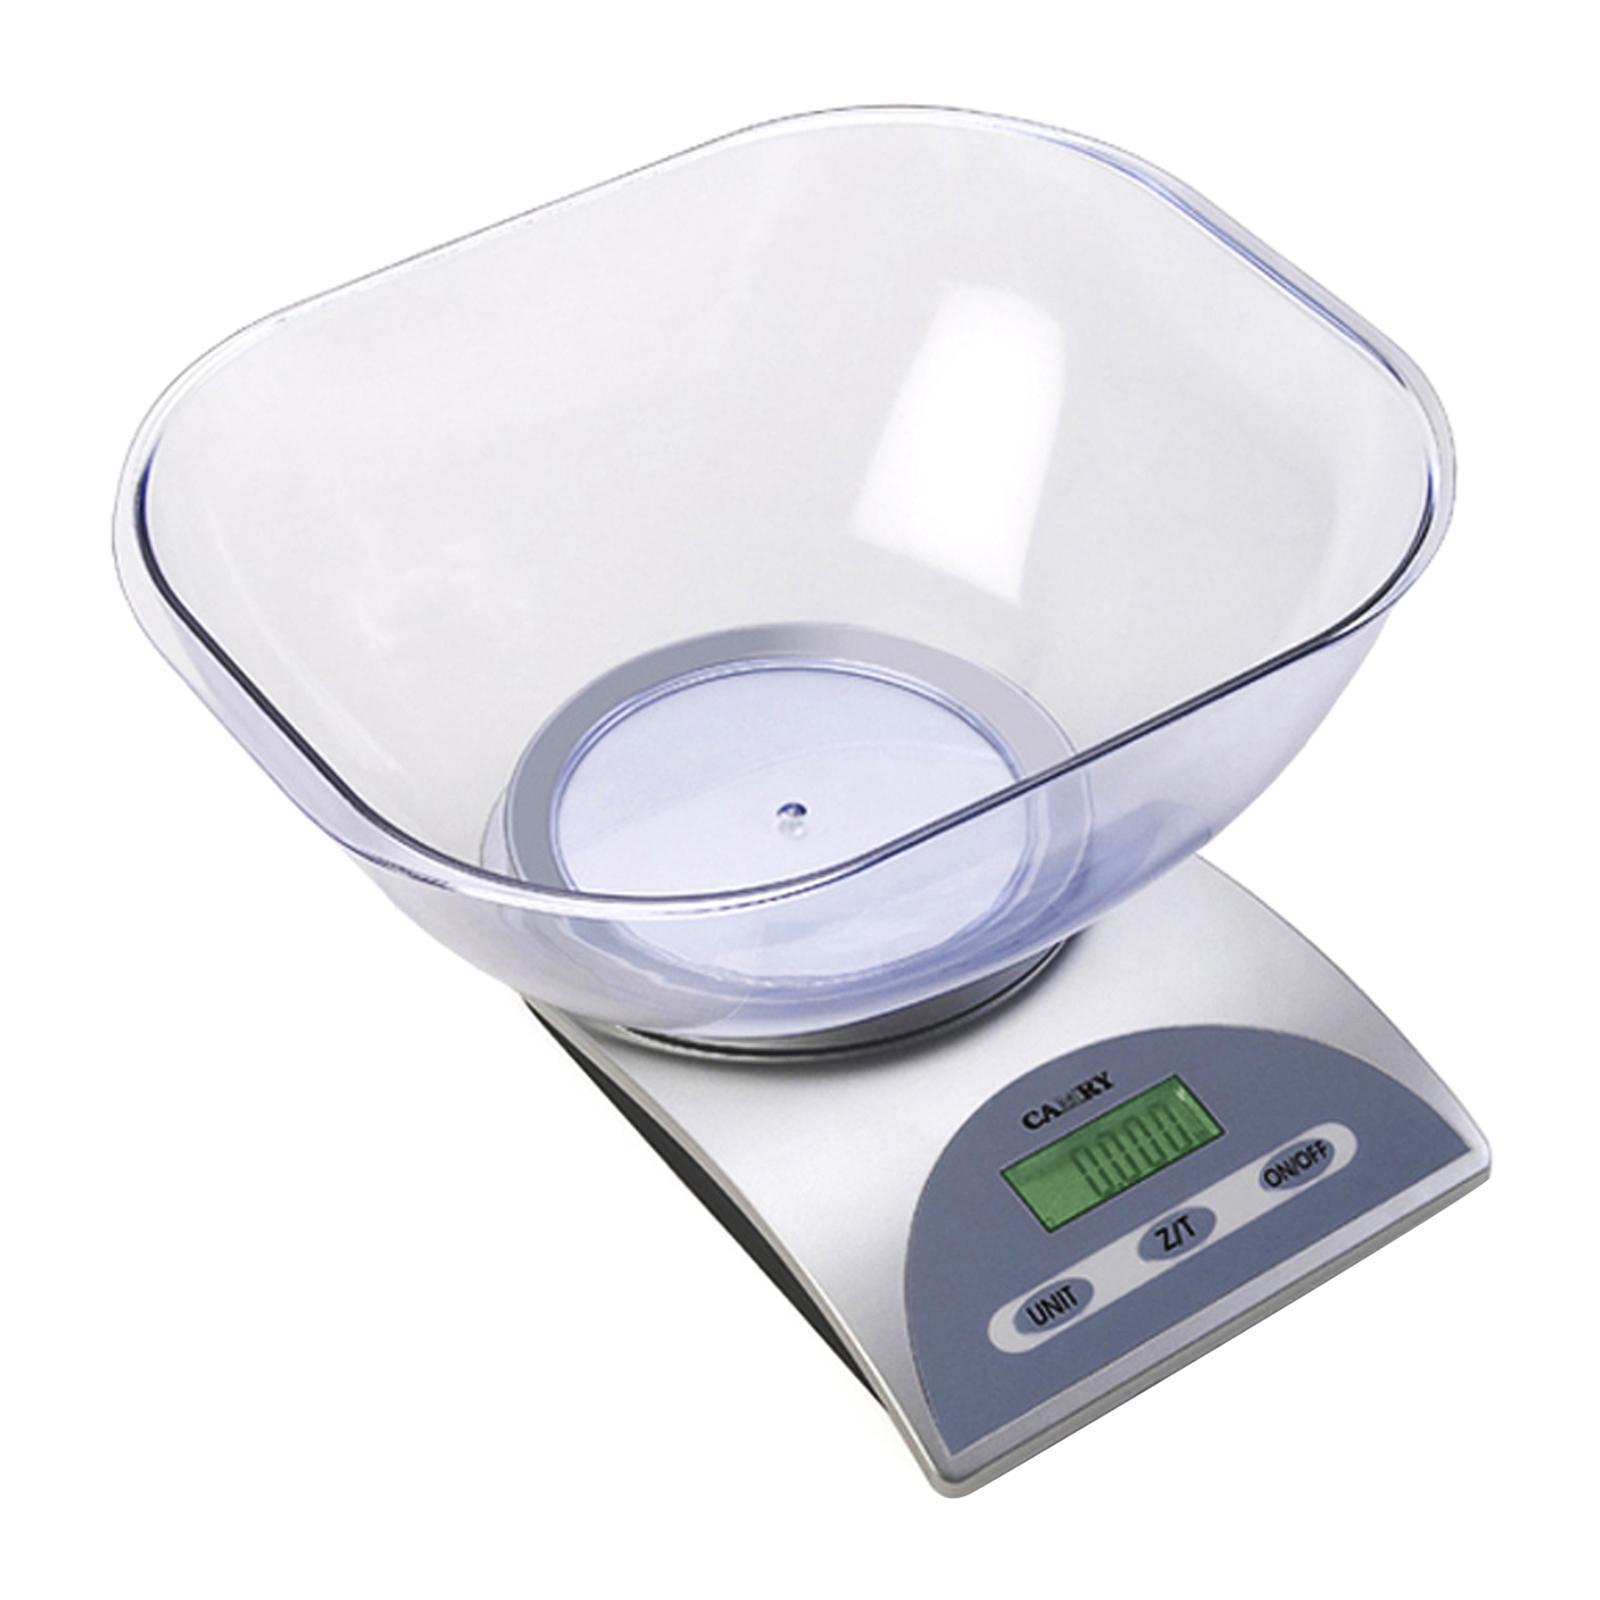 Camry Digital Kitchen Scale 5kg